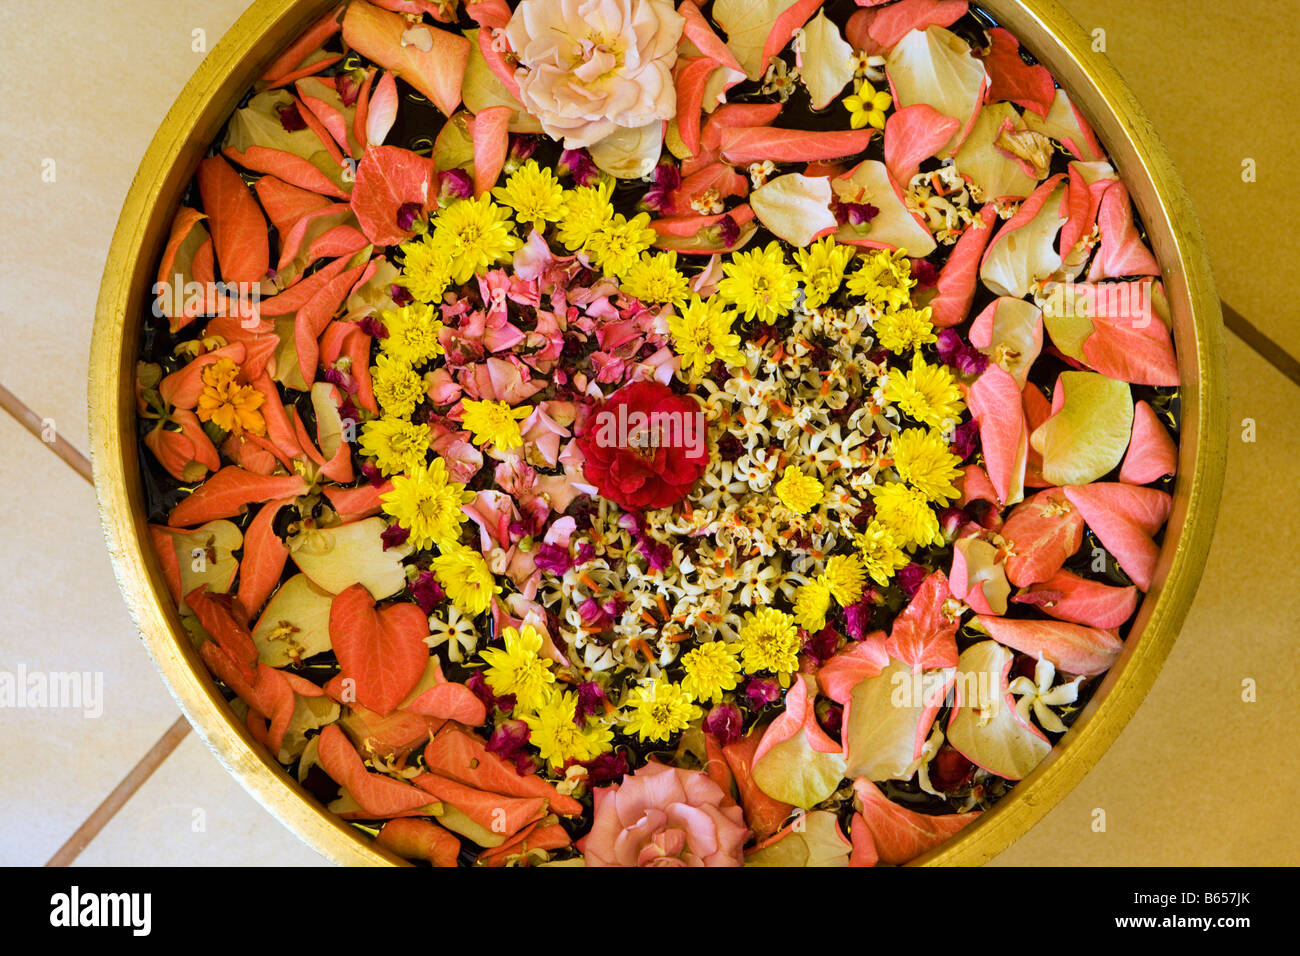 India, Mumbai, Maharashtra, Ayurvedic Therapy Center, Flowers at entrance of clinic. - Stock Image